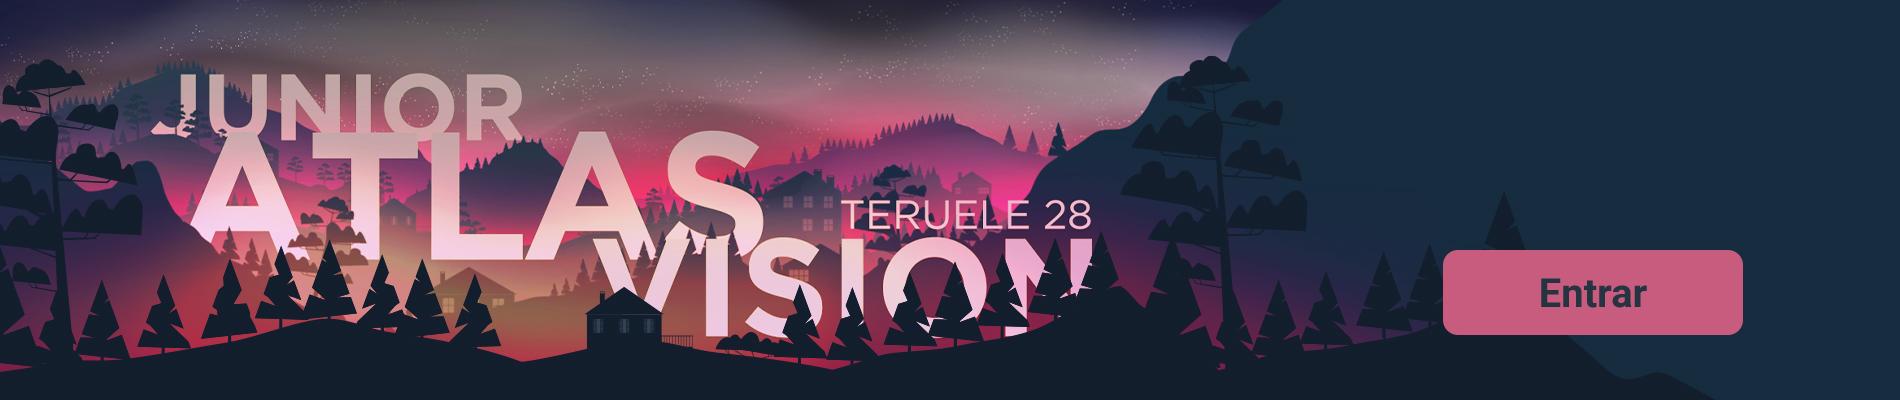 Teruele 28 (Saoirse)